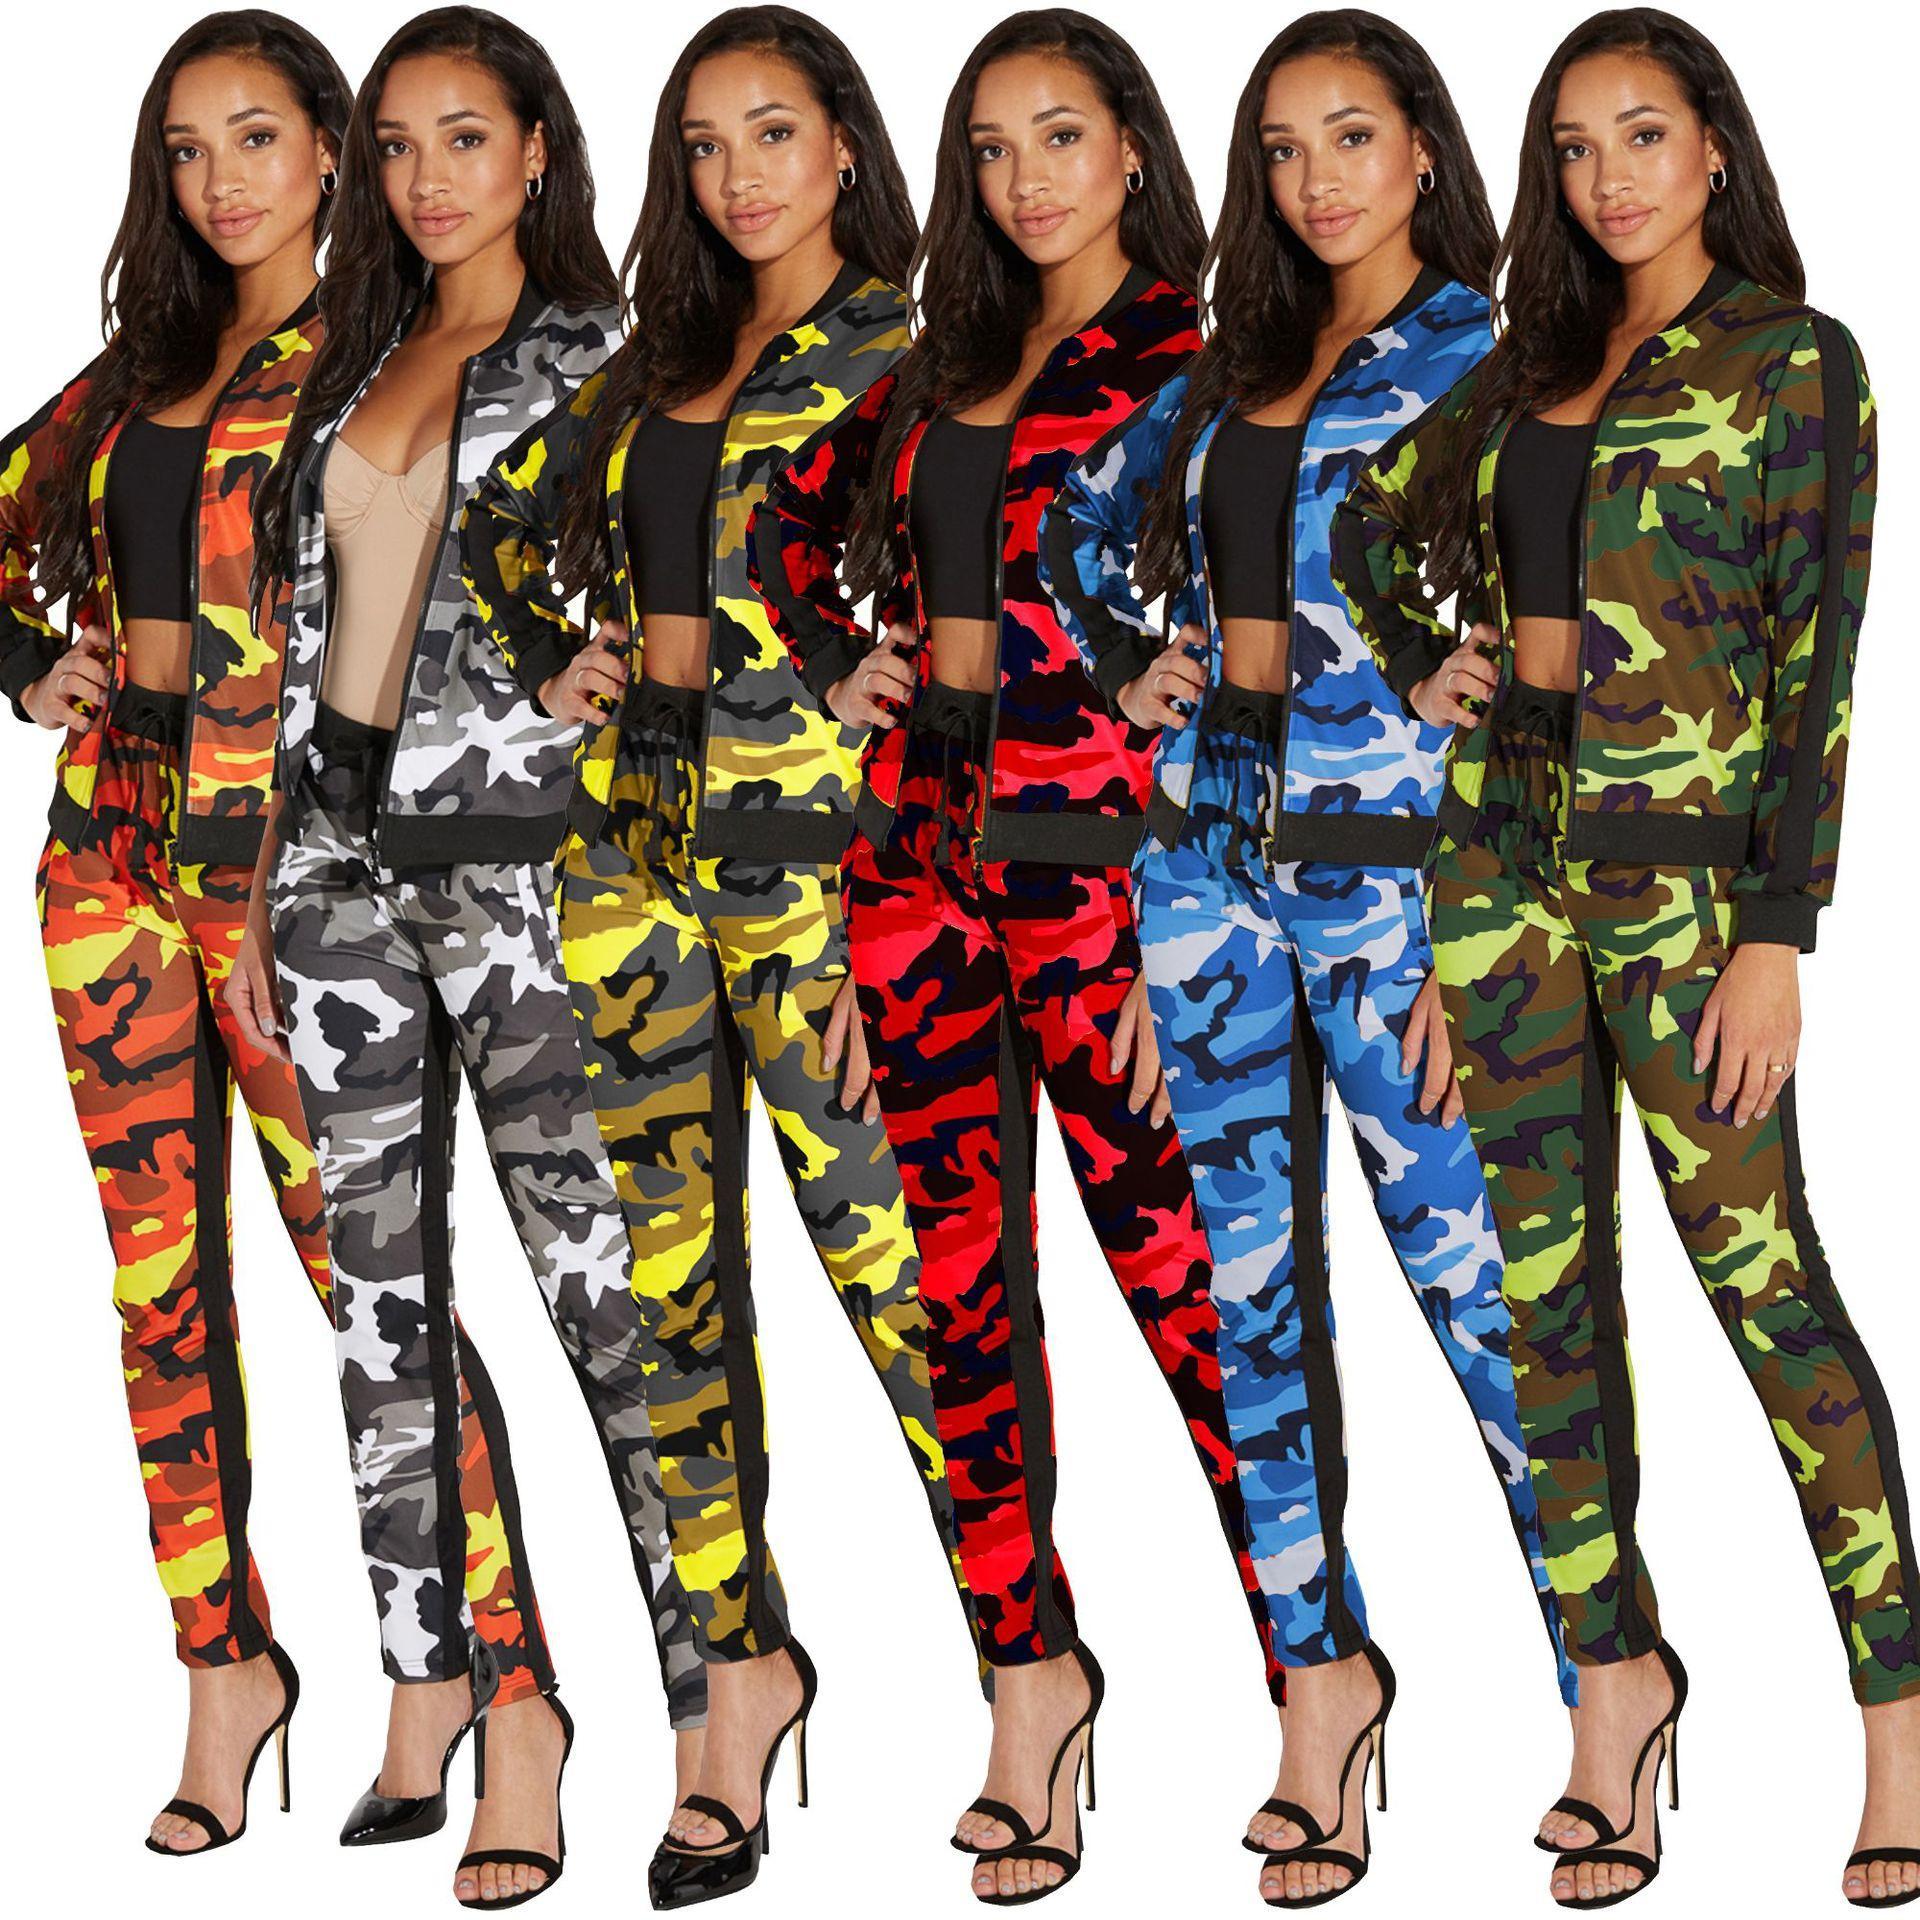 Acquista Donna Camo 2 Pezzi Imposta Pantaloni Abiti Lady Zipper Manica  Lunga Giacca Coulisse Pantaloni Lunghi Pantaloni Casual Due Pezzi Pantaloni  A  19.1 ... 37f716c9636